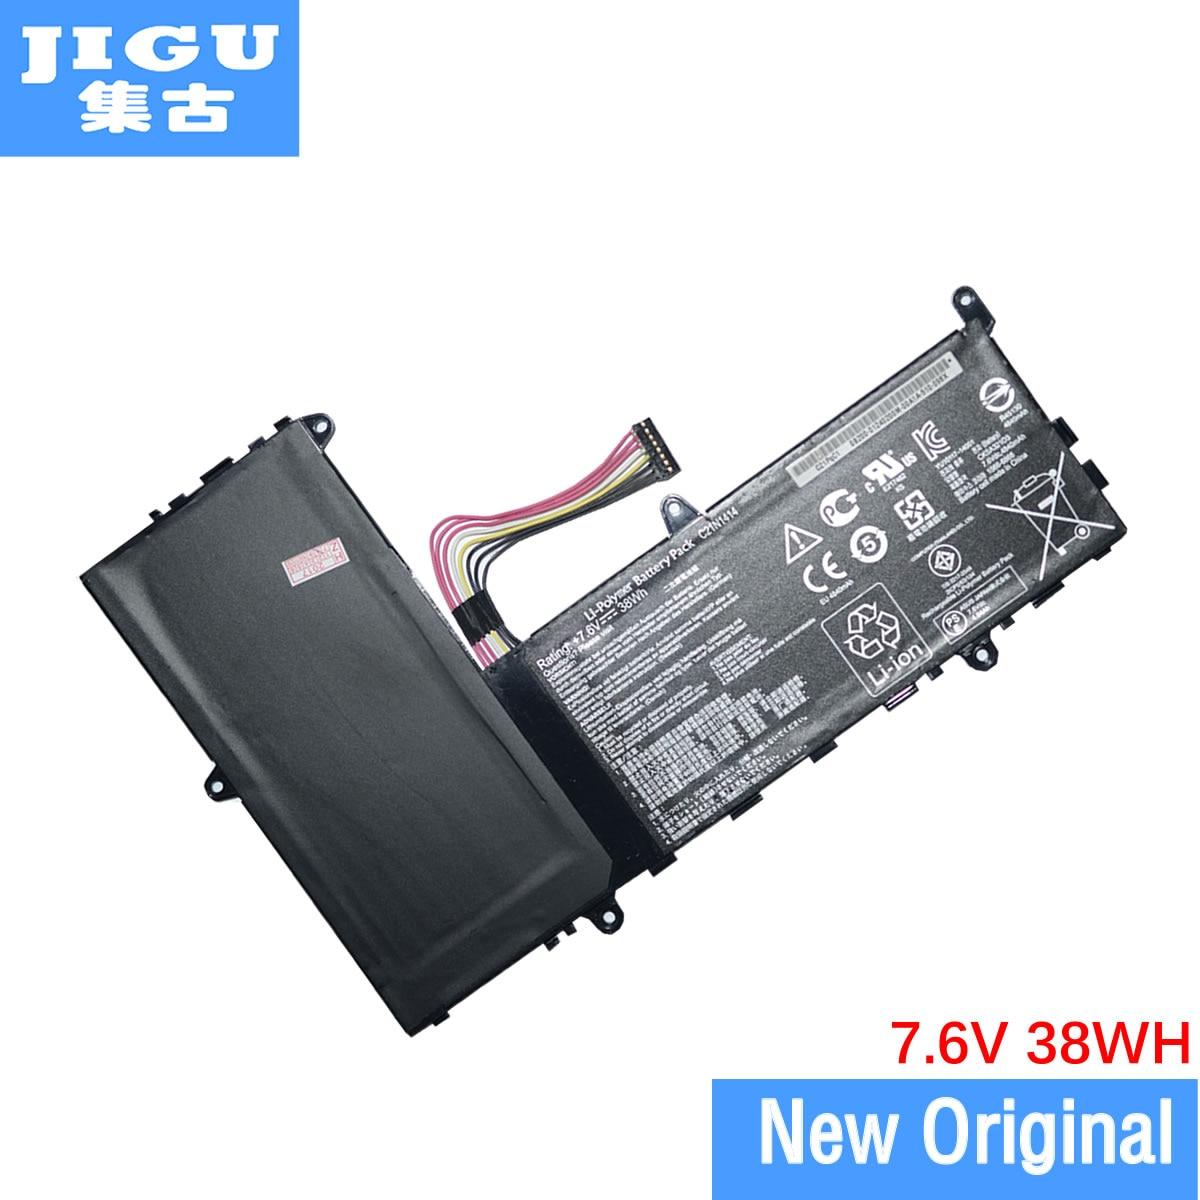 JIGU, batería para ordenador portátil, C21N1414 C21PQ91 CKSE321D1 para Asus EeeBook X205 EeeBook F205TA X205TA F205TA F205TA-1A F205TA-1B